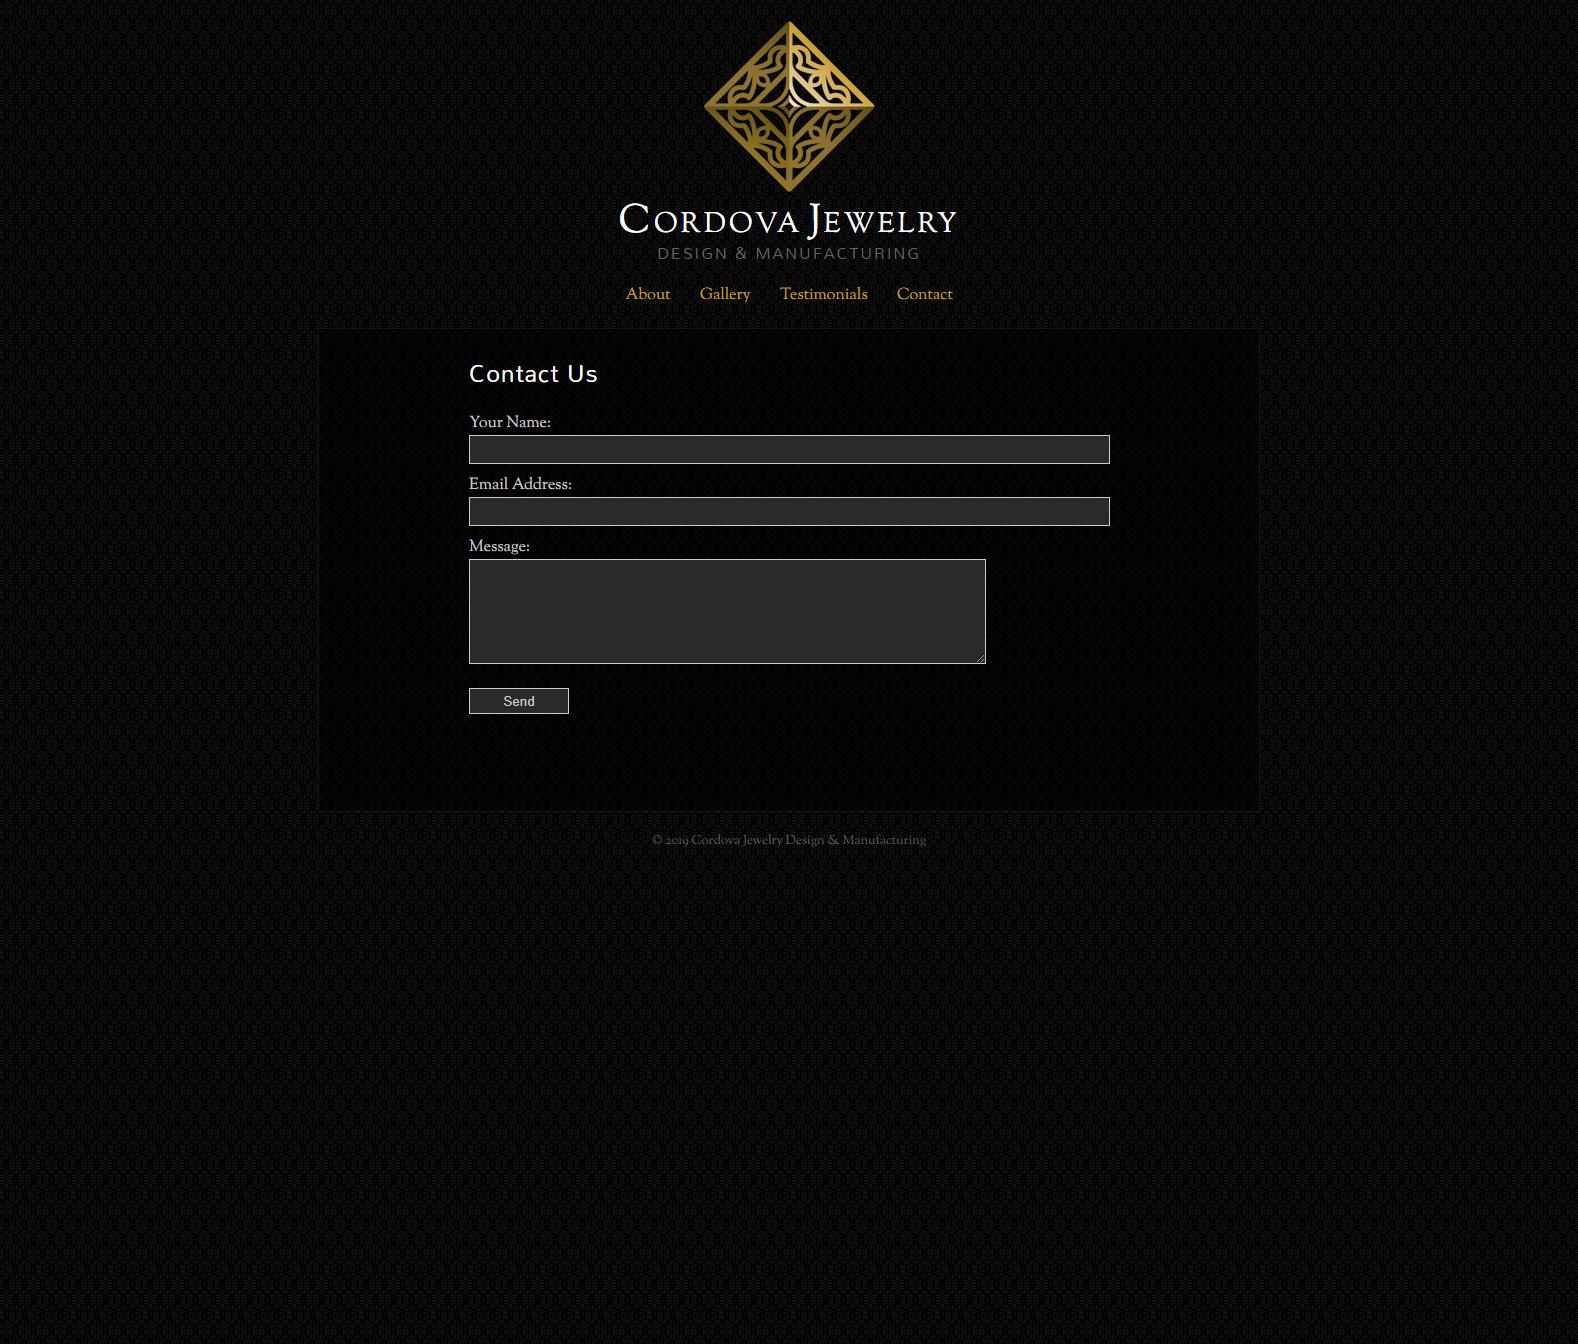 Cordova Jewelry - Contact Page